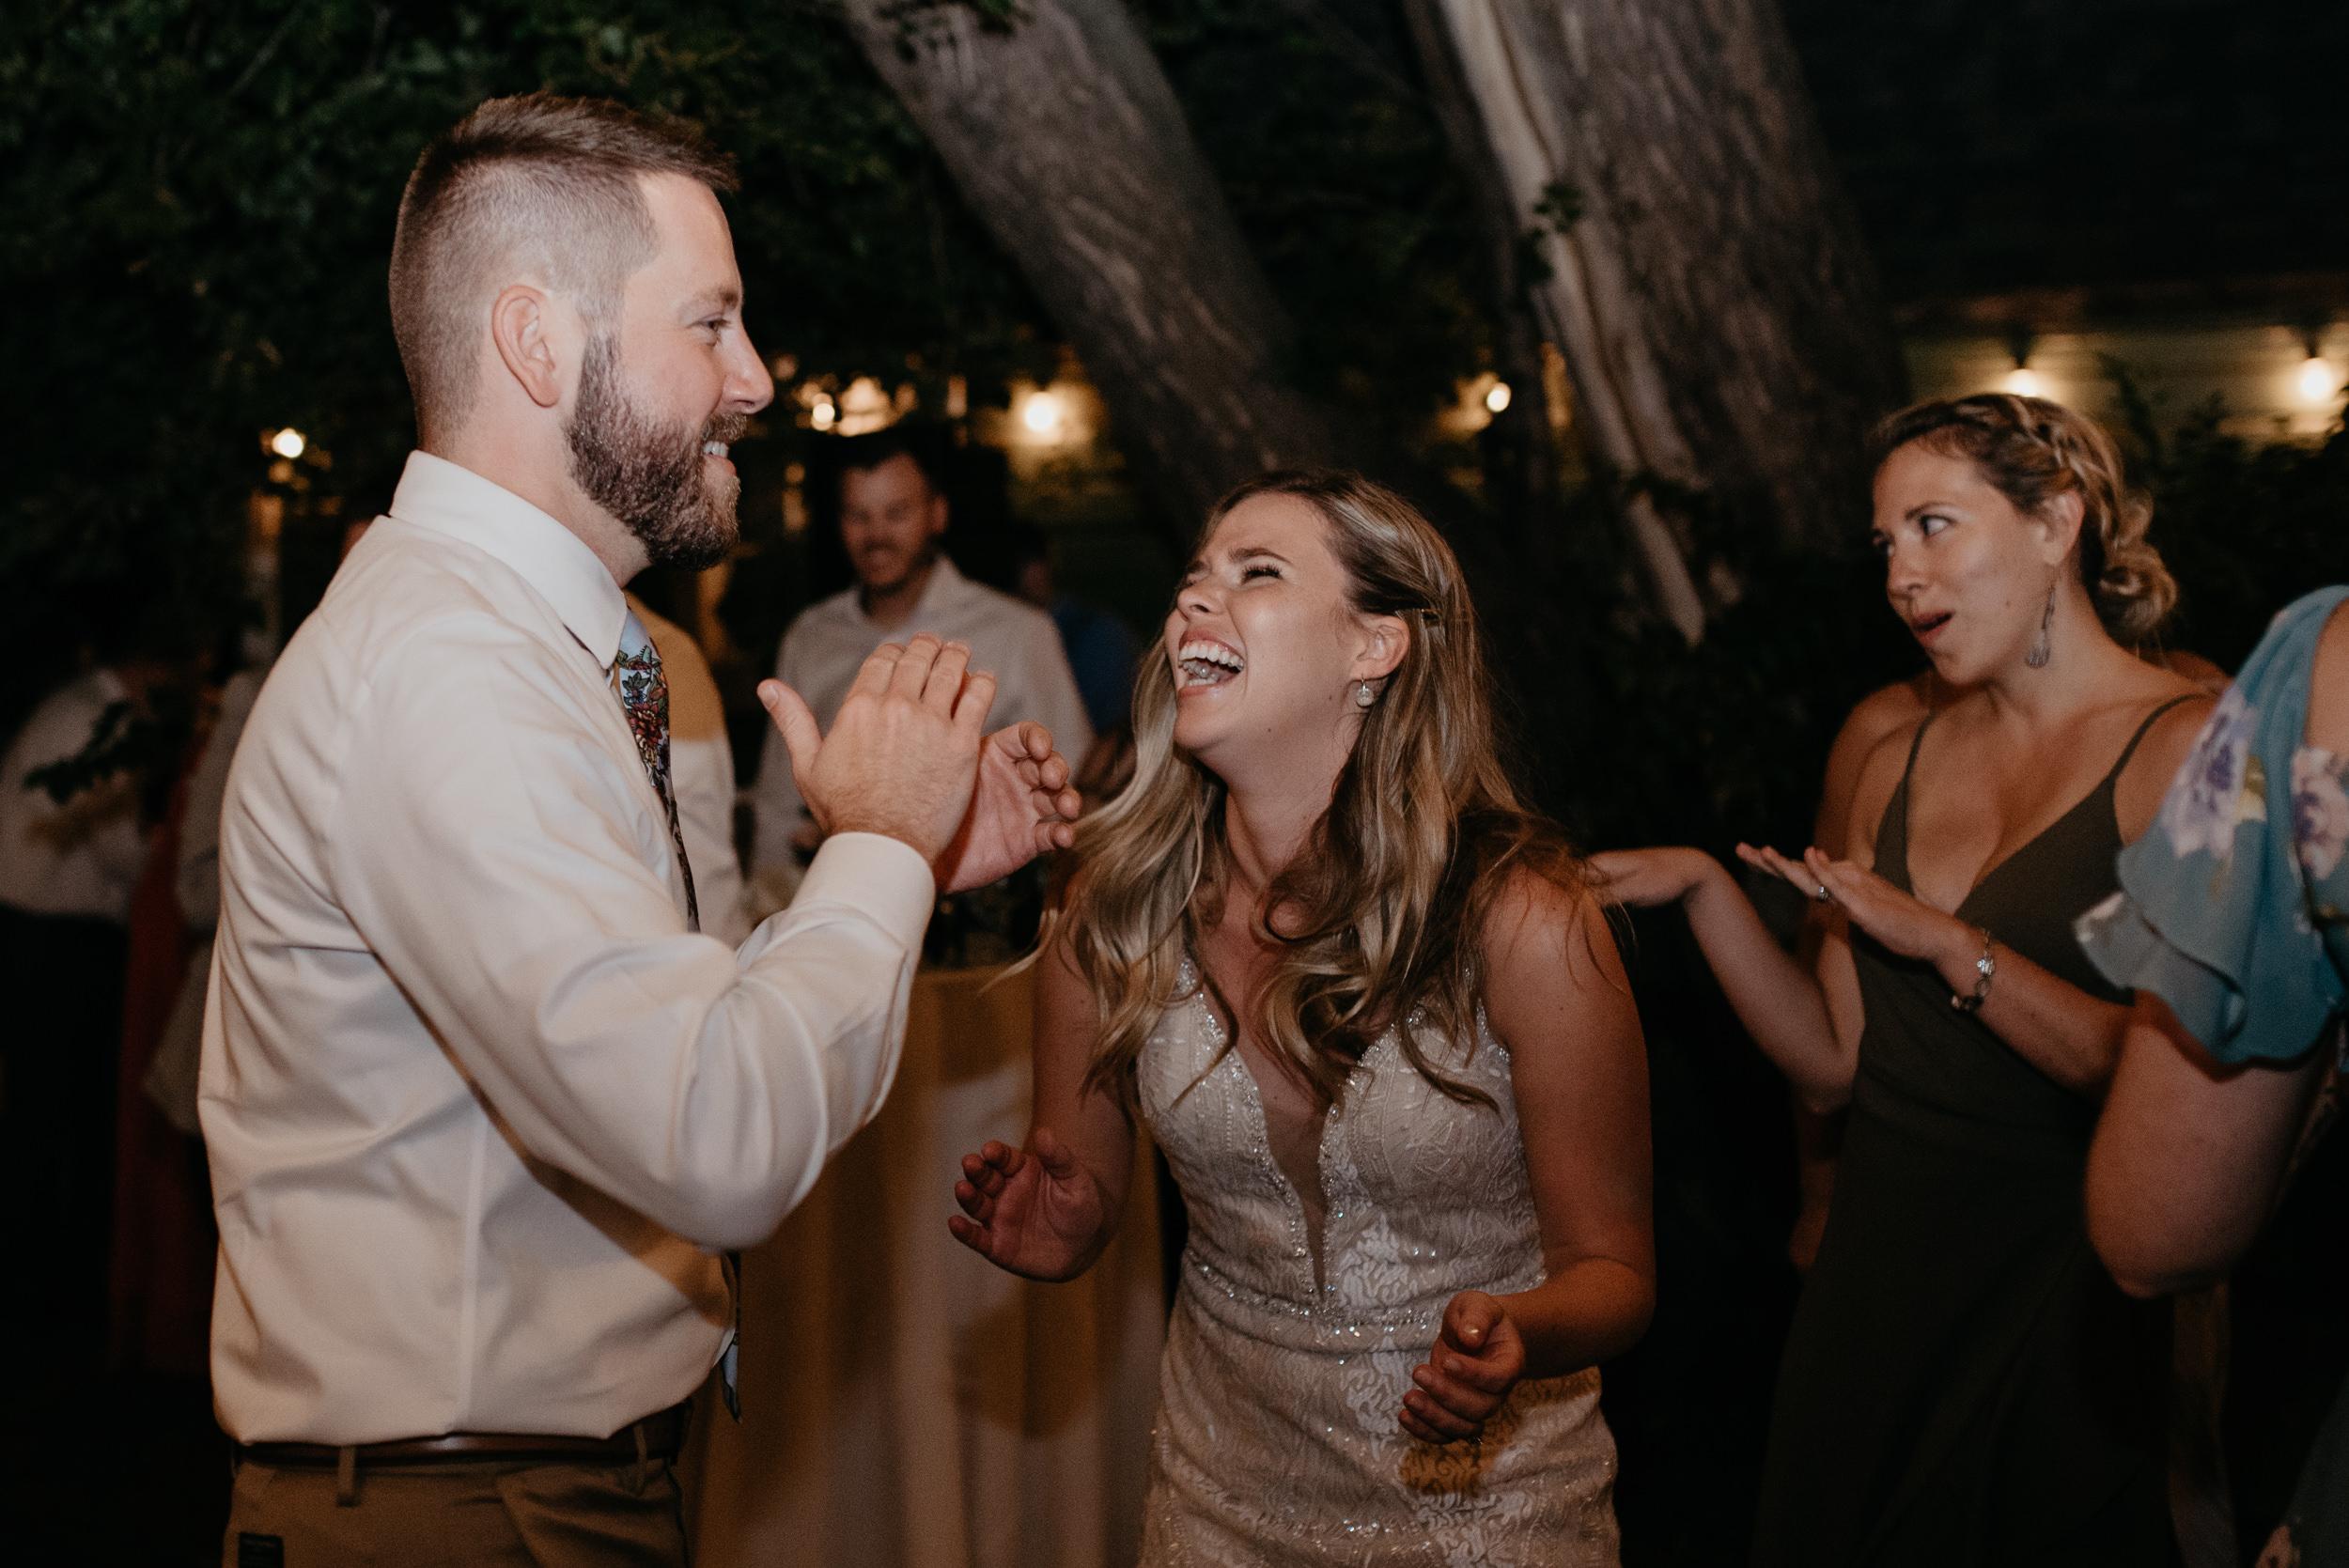 Colorado elopement and wedding photographer. Friends dancing at Boulder wedding reception.